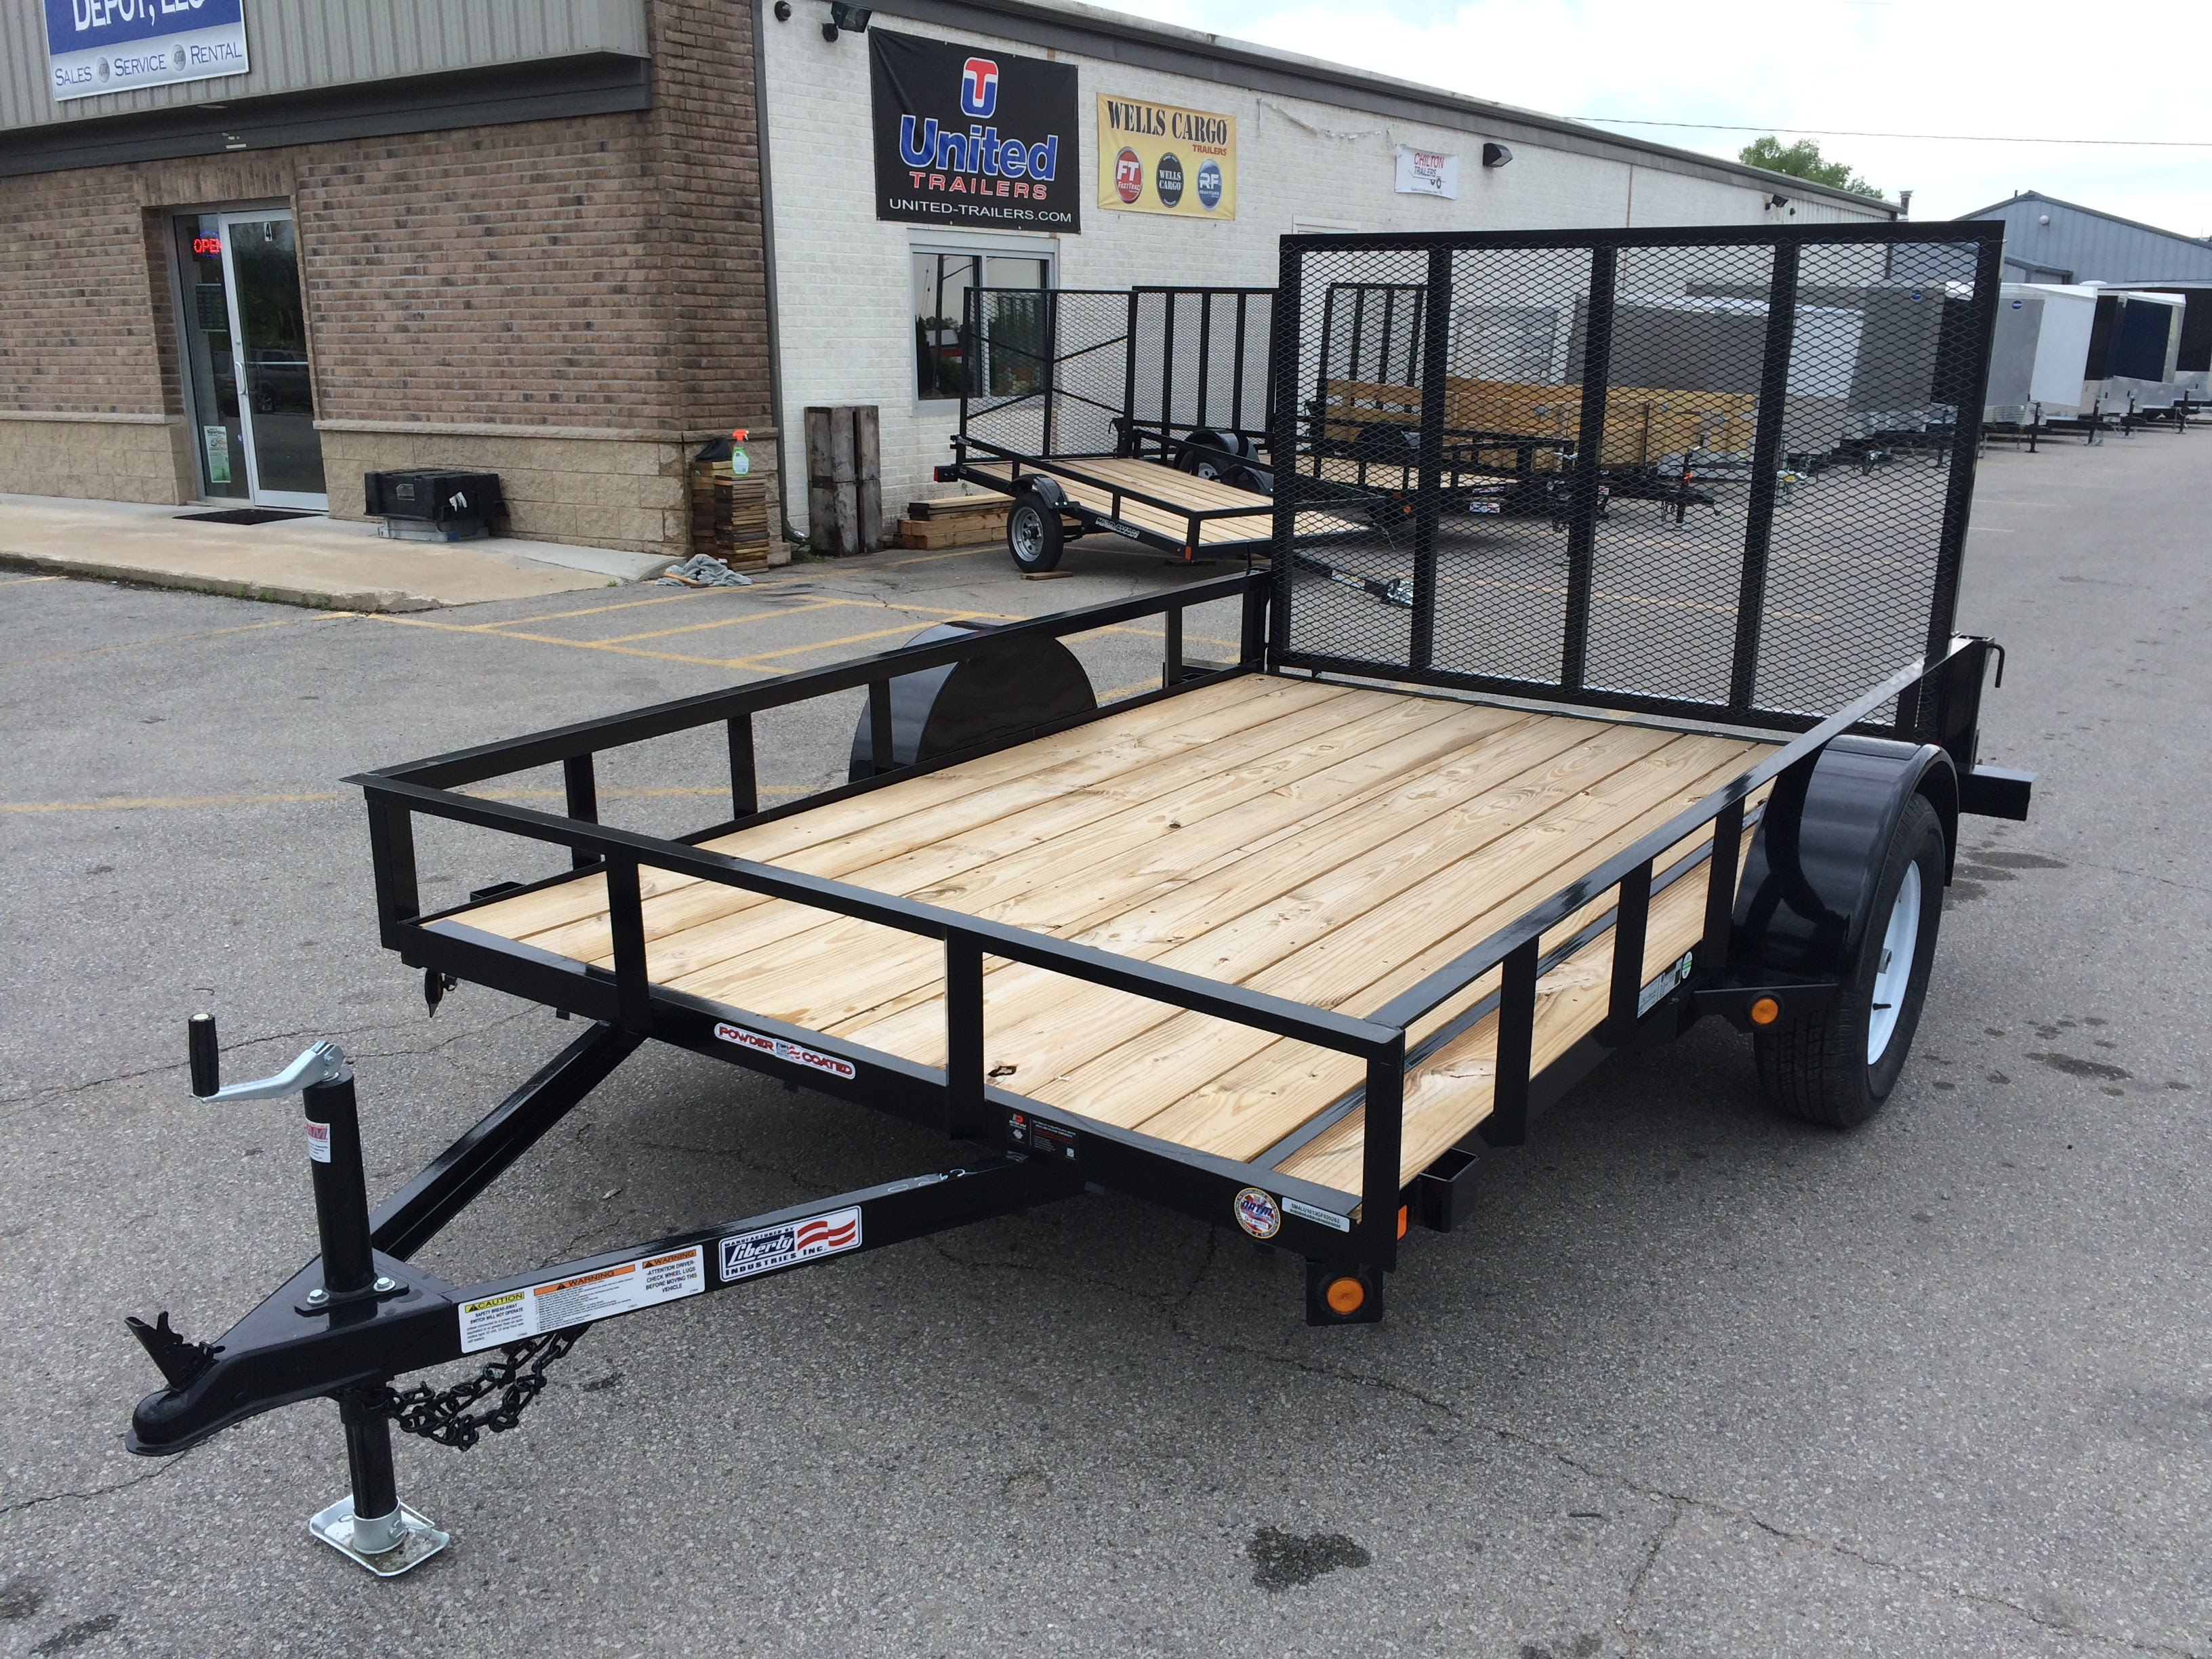 2018 Liberty 6 5 x 10 Utility Trailer Bay Trailer Depot